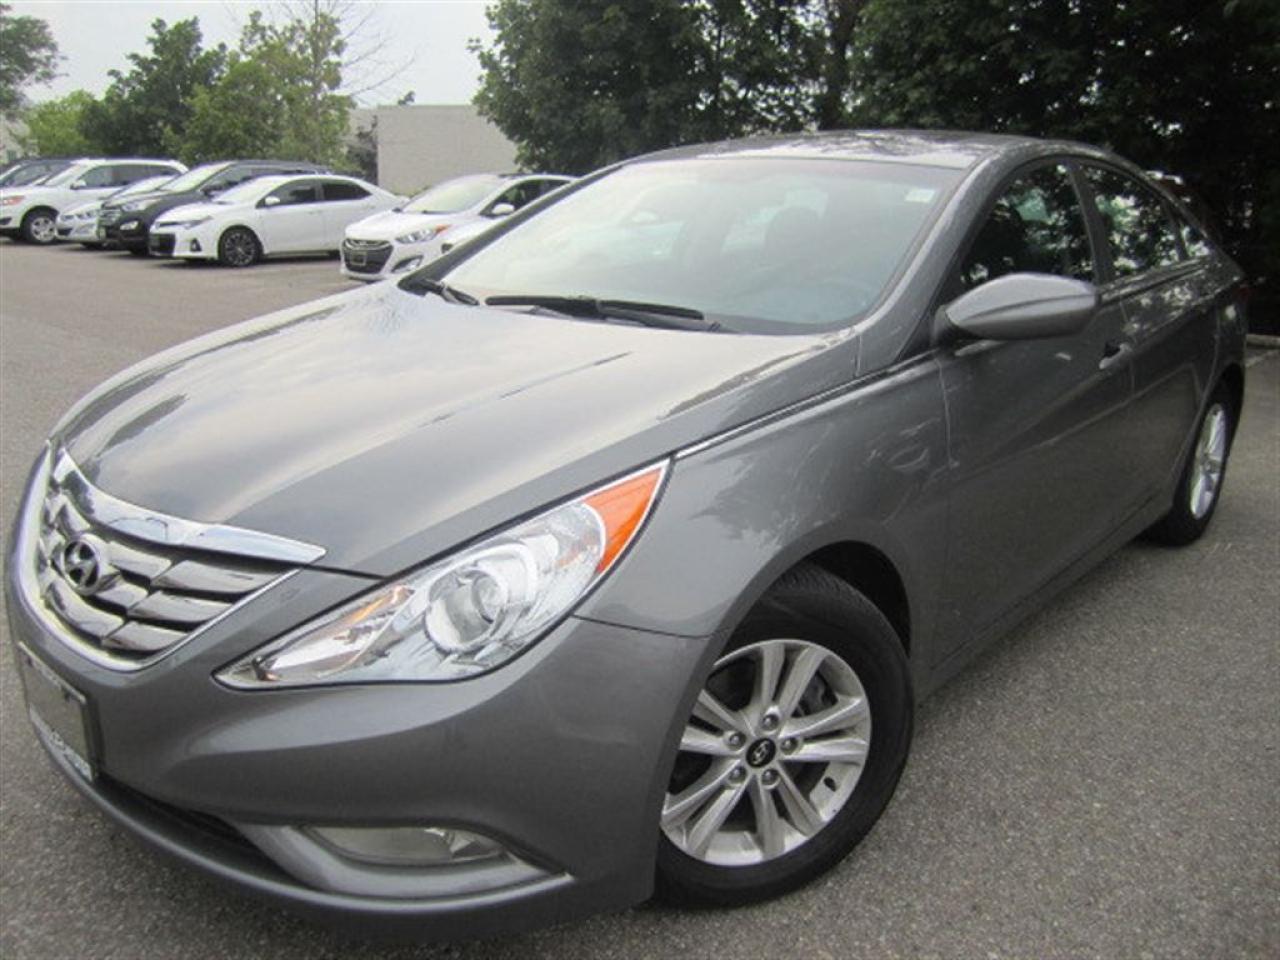 Photo of Dark Grey 2013 Hyundai Sonata